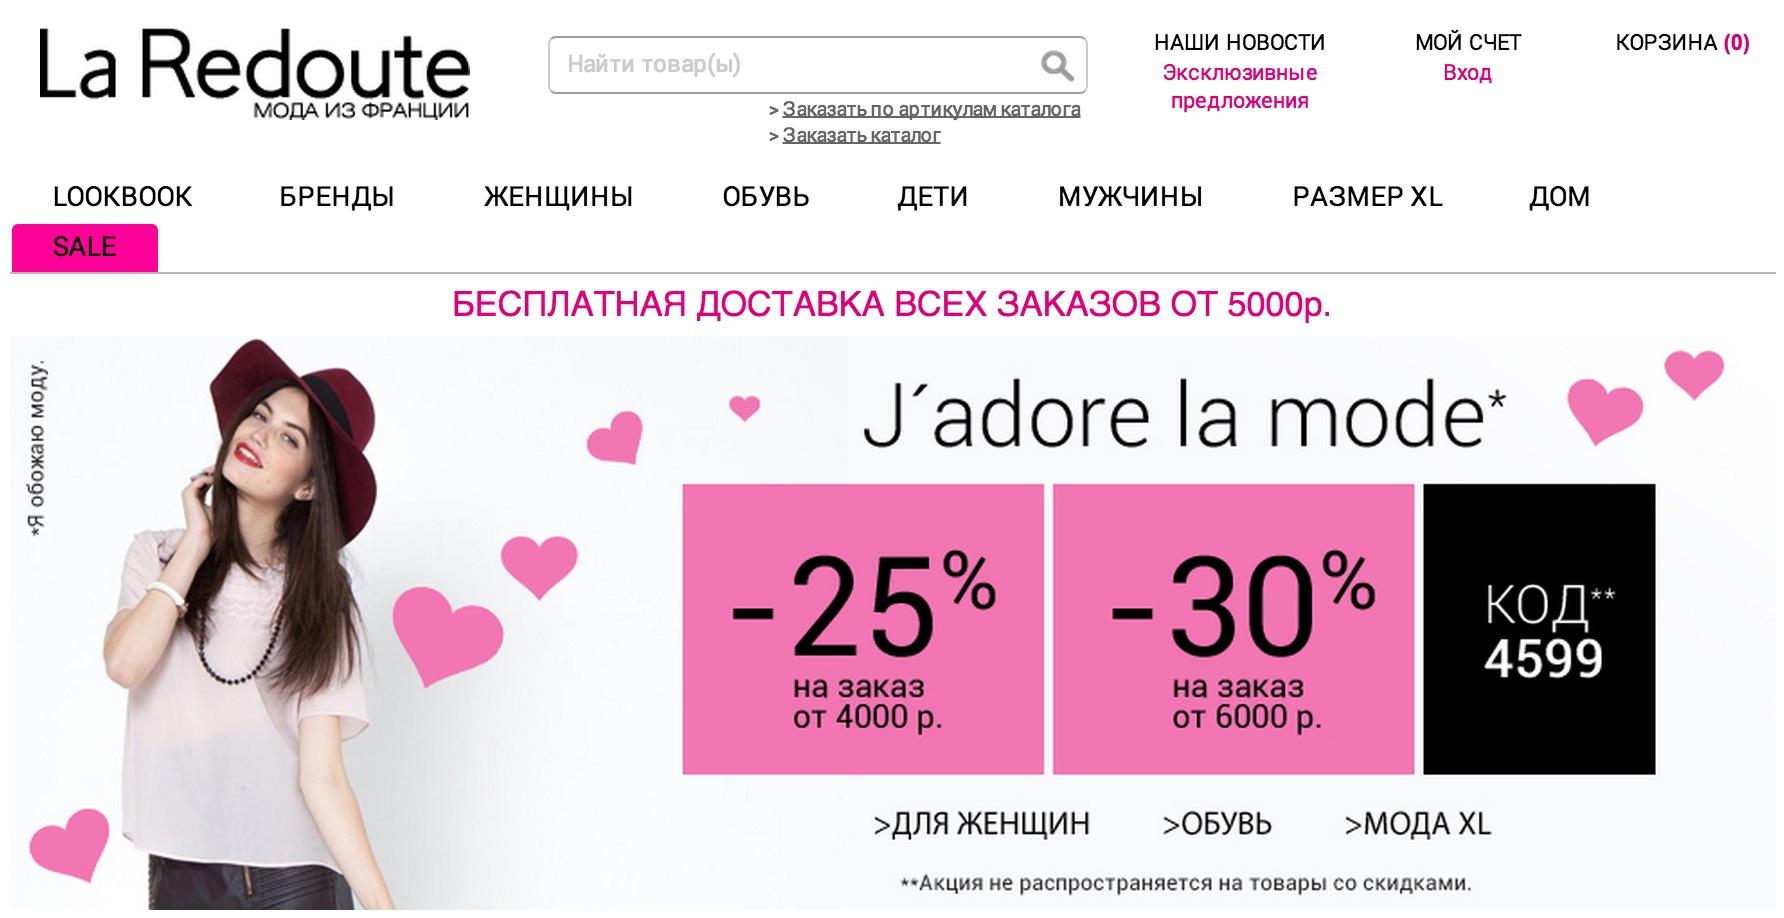 интернет магазин ла редут: